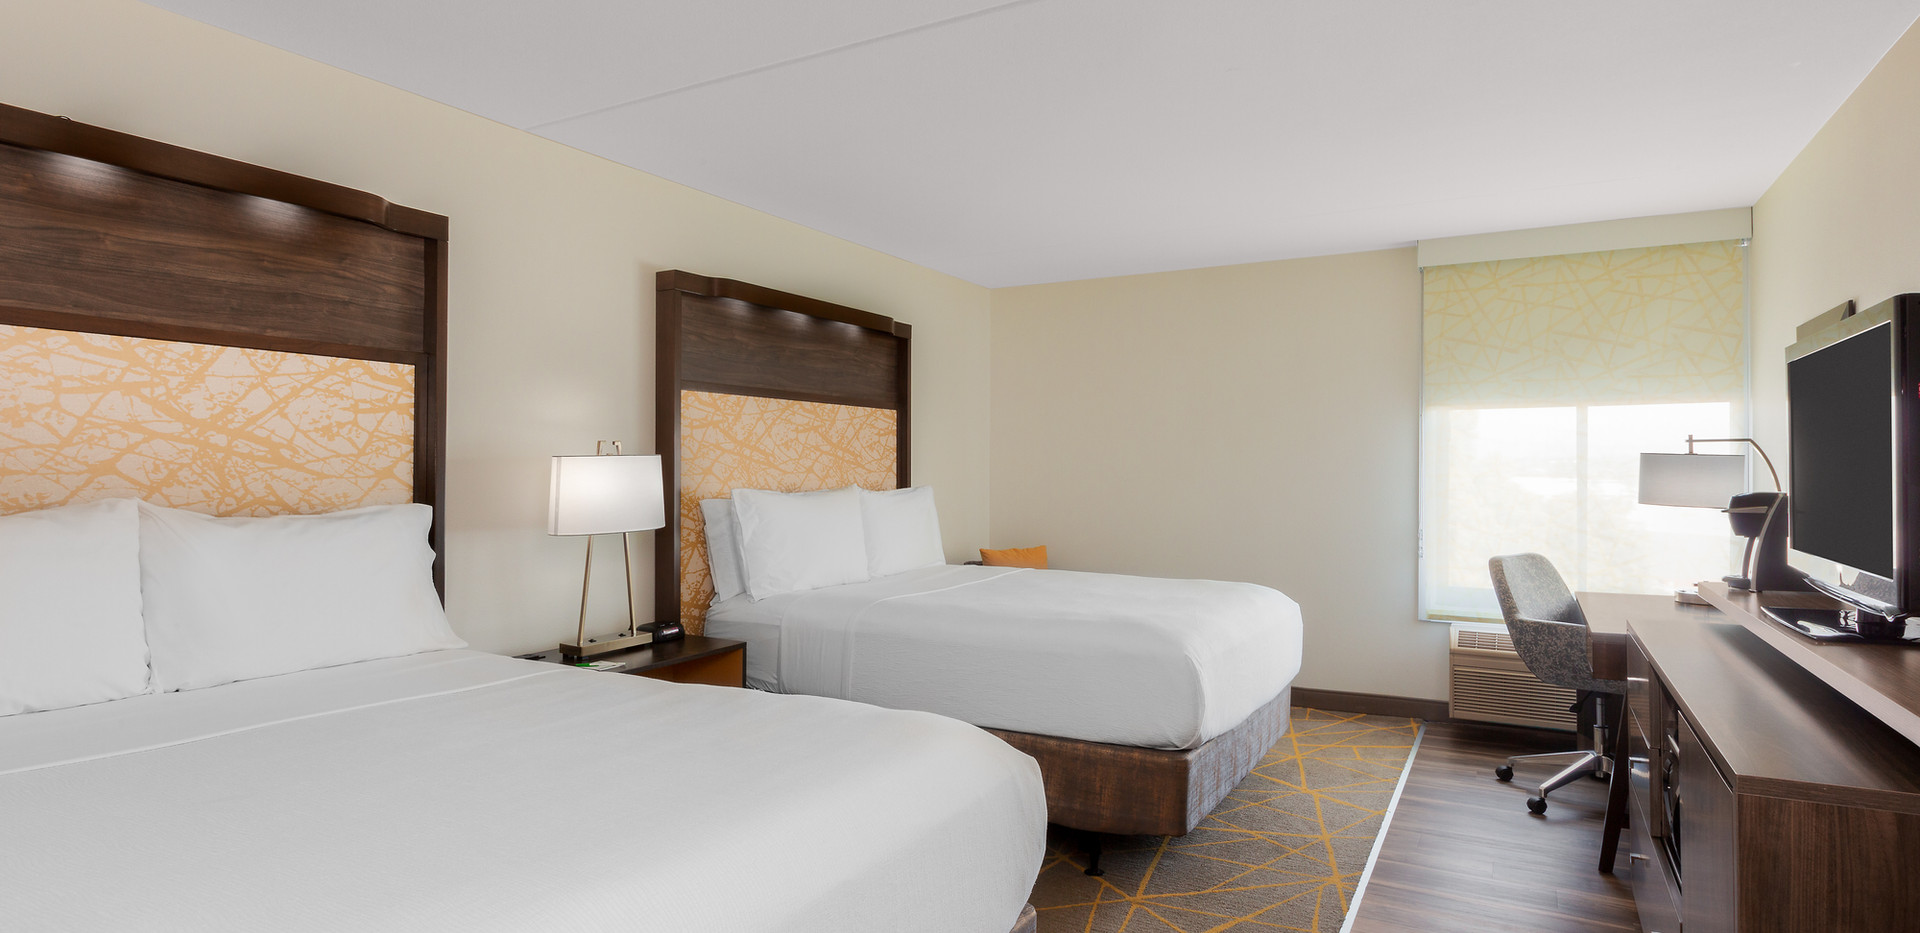 Holiday Inn La Mirada Double Queen Guest